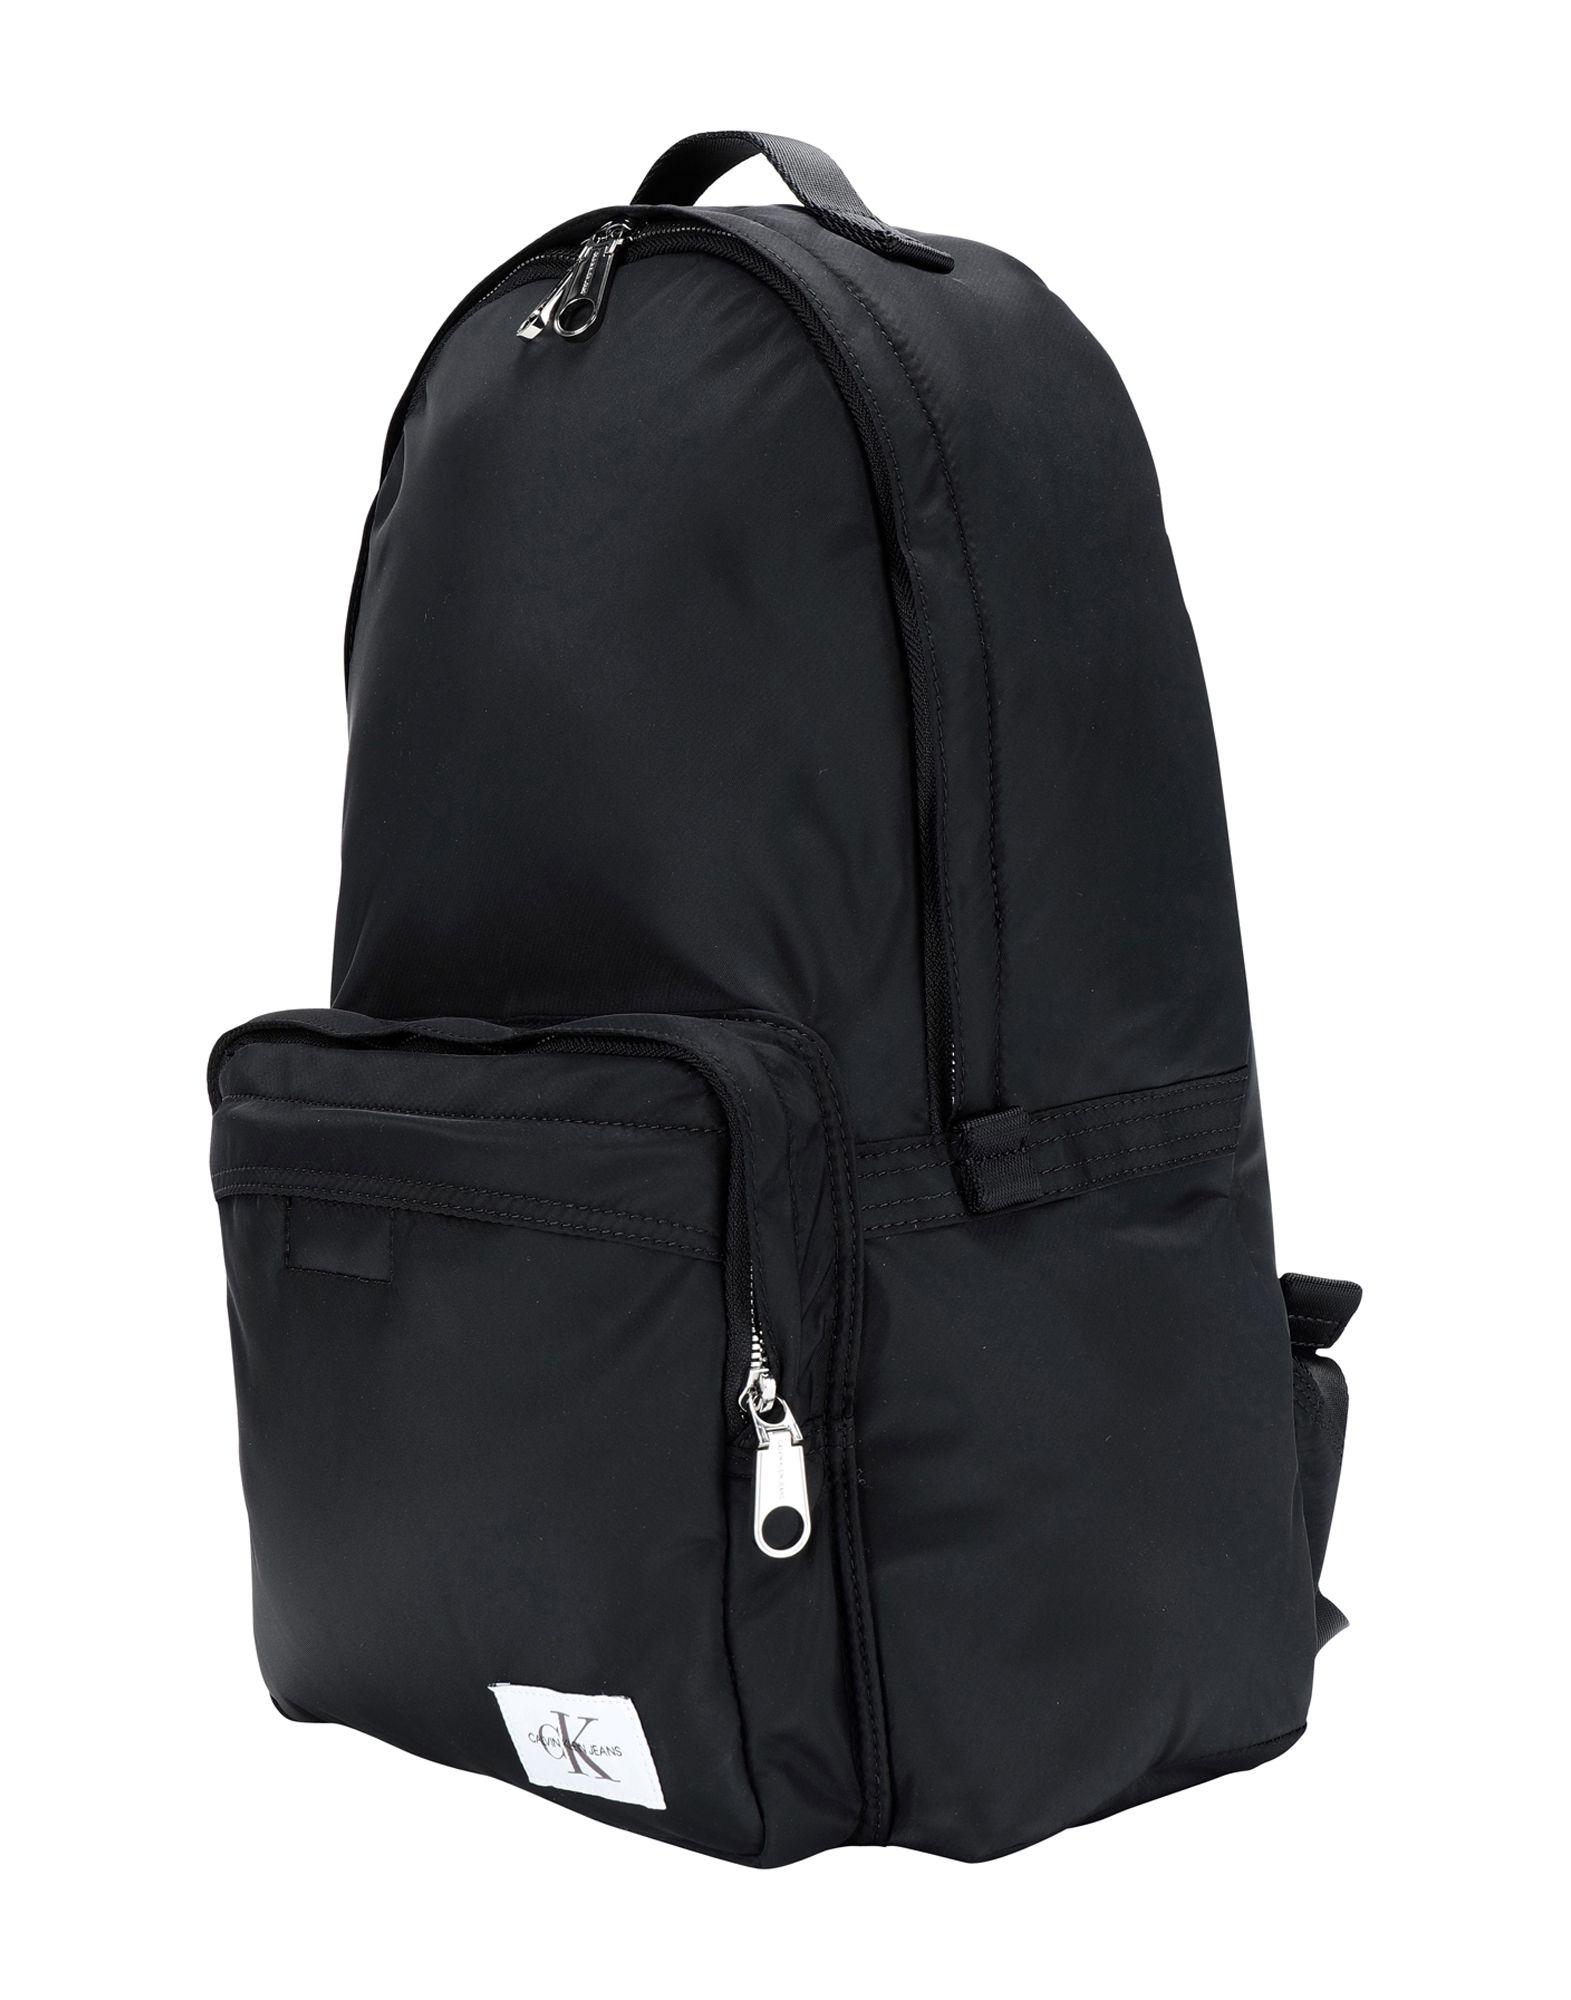 купить CALVIN KLEIN JEANS Рюкзаки и сумки на пояс по цене 5950 рублей